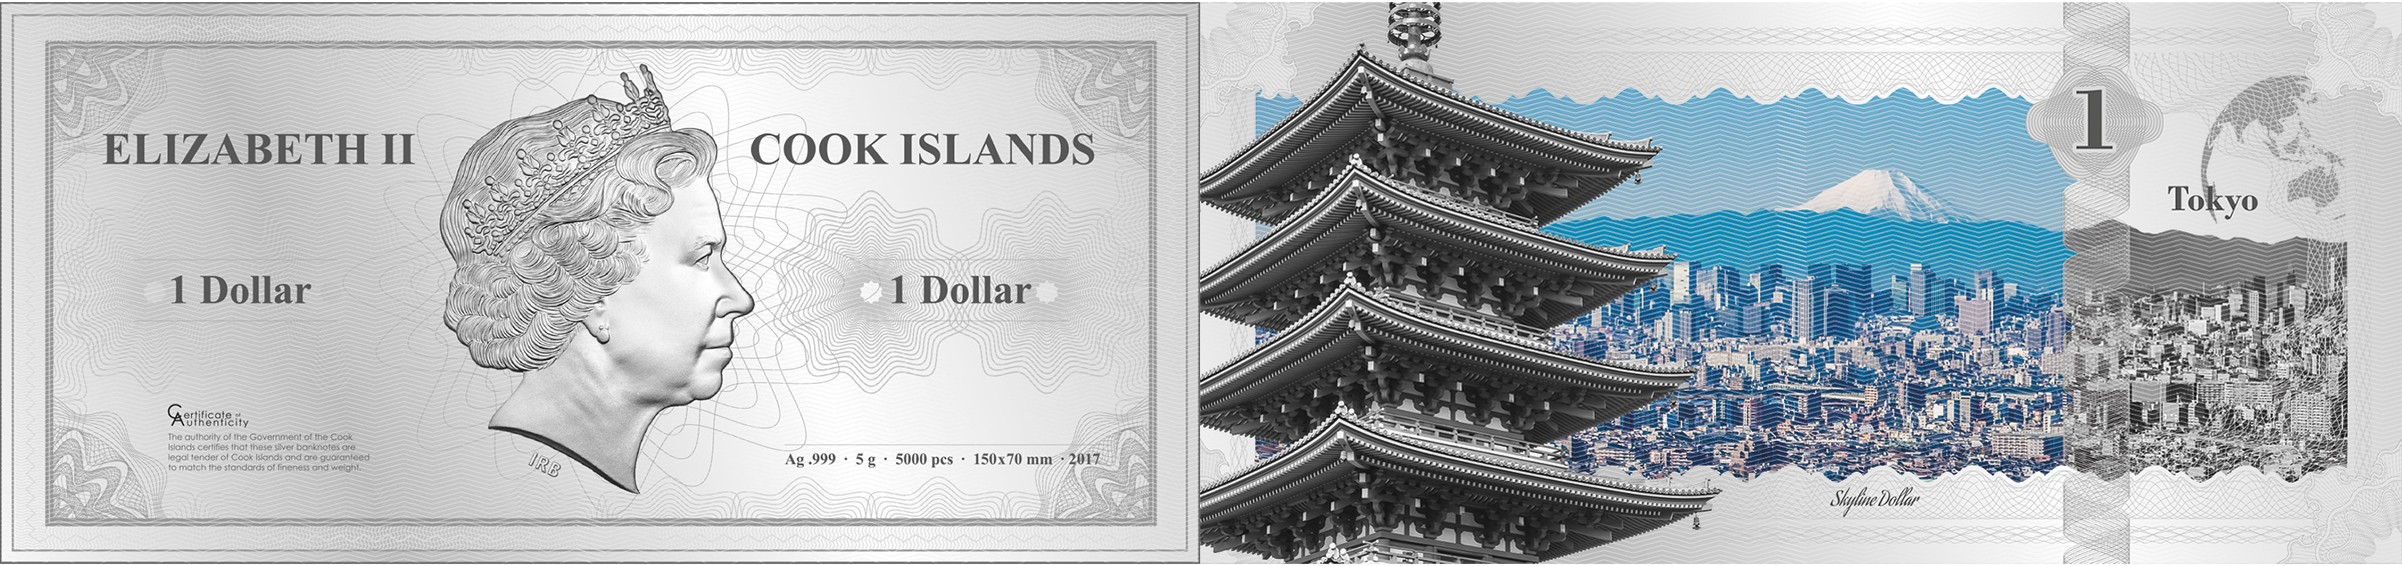 cook isl 2017 skyline dollar tokyo